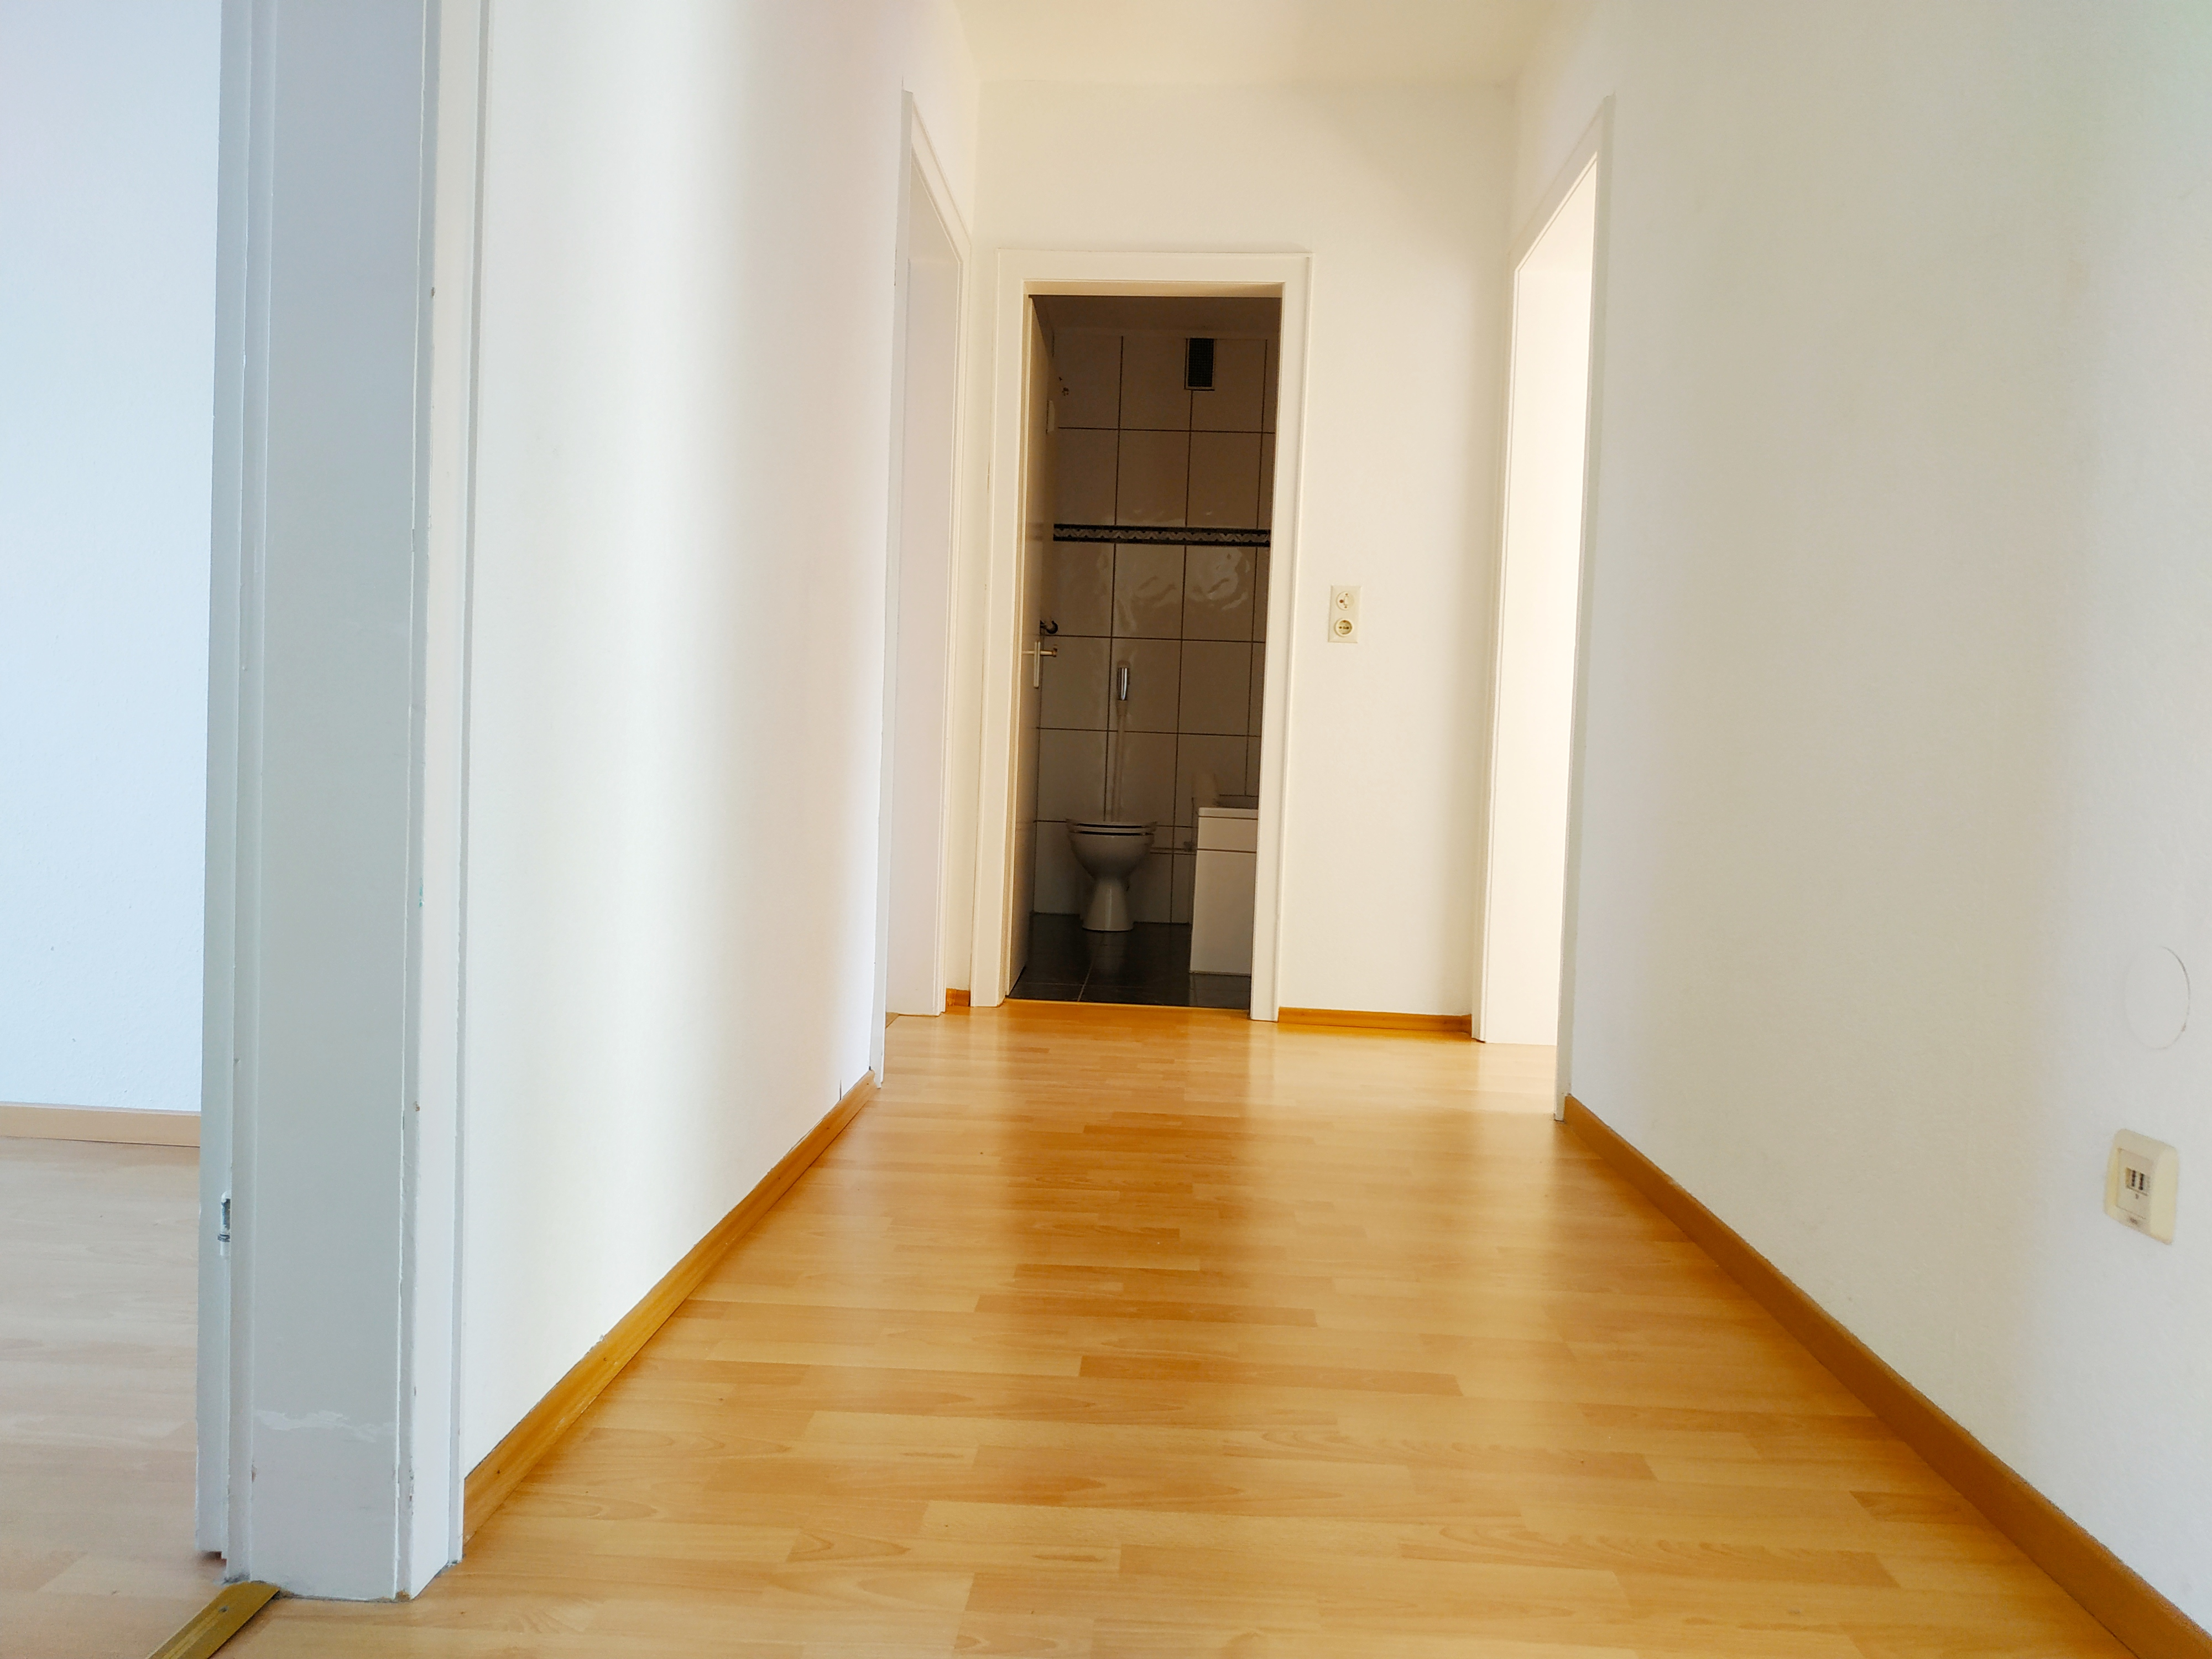 3 Zimmer in ruhiger Lage im Dachgeschoss